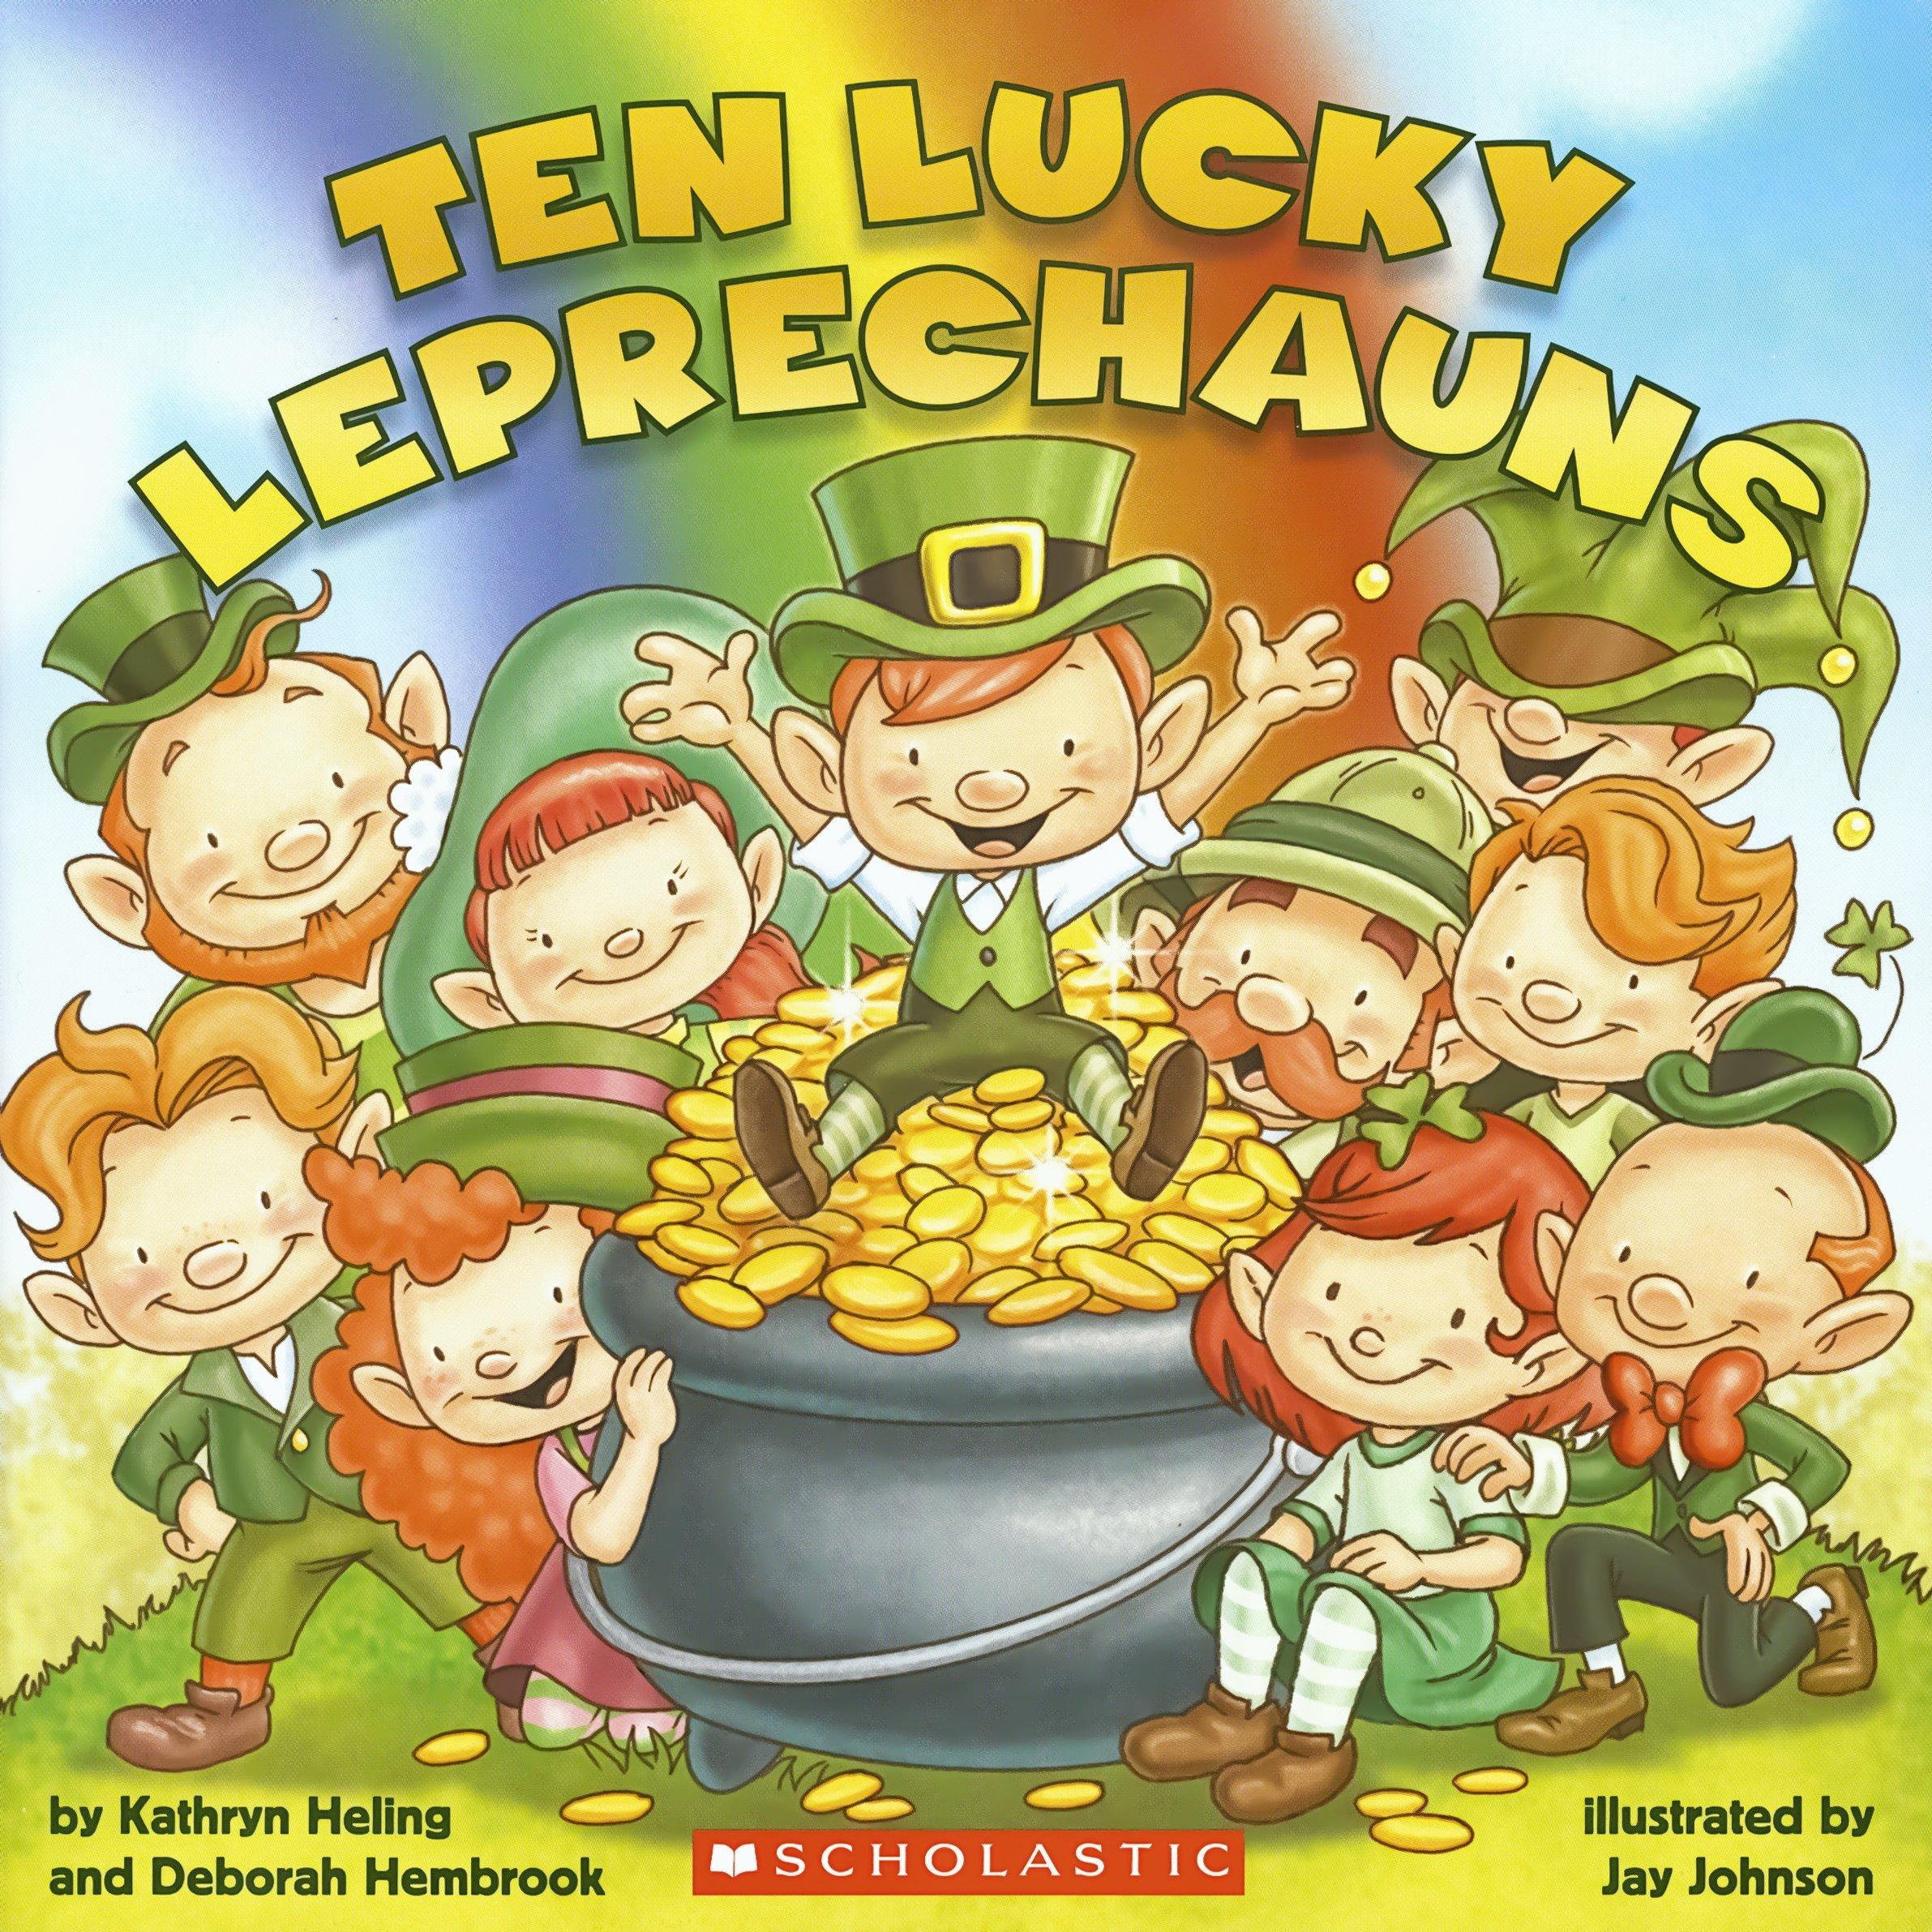 Uncategorized St Patrick Day Leprechaun Story amazon com ten lucky leprechauns 9780545436489 kathryn heling deborah hembrook jay johnson books